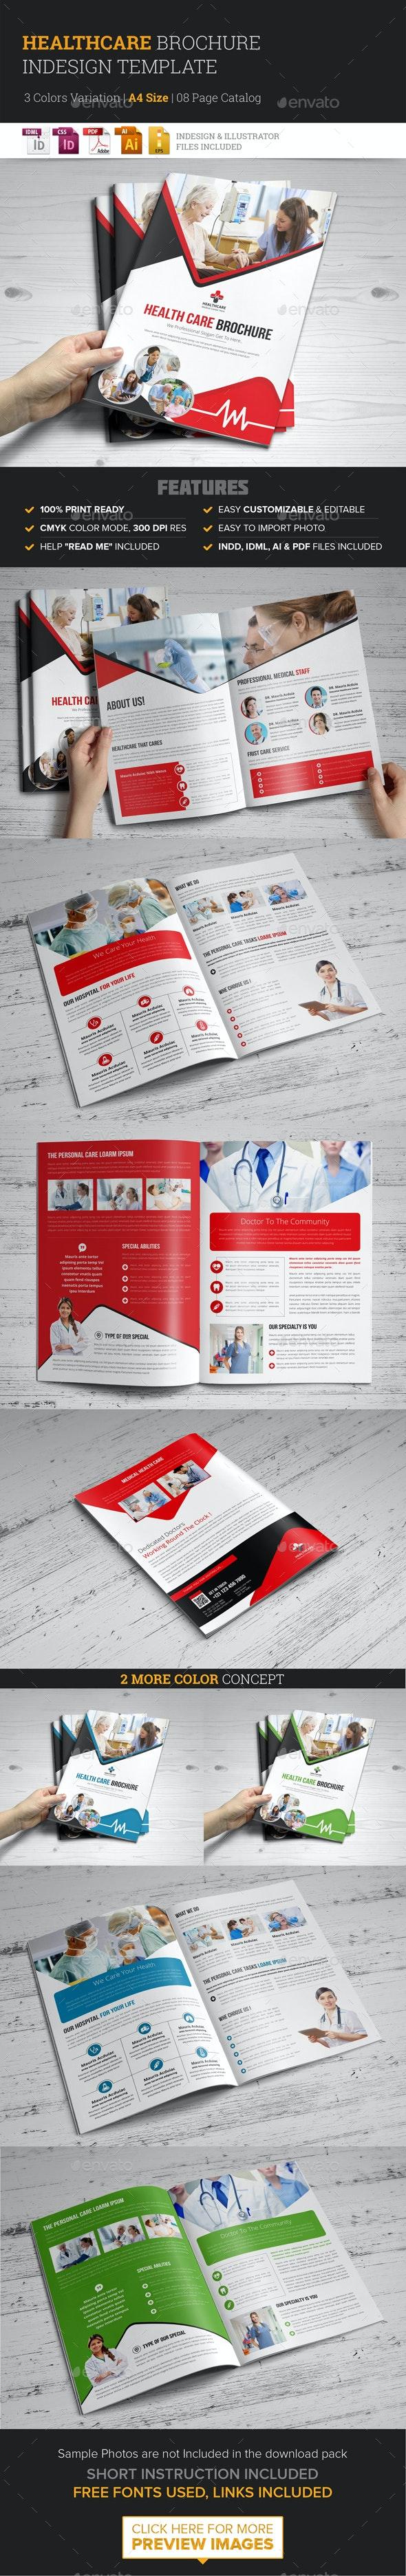 Medical Healthcare Brochure Indesign Template - Corporate Brochures